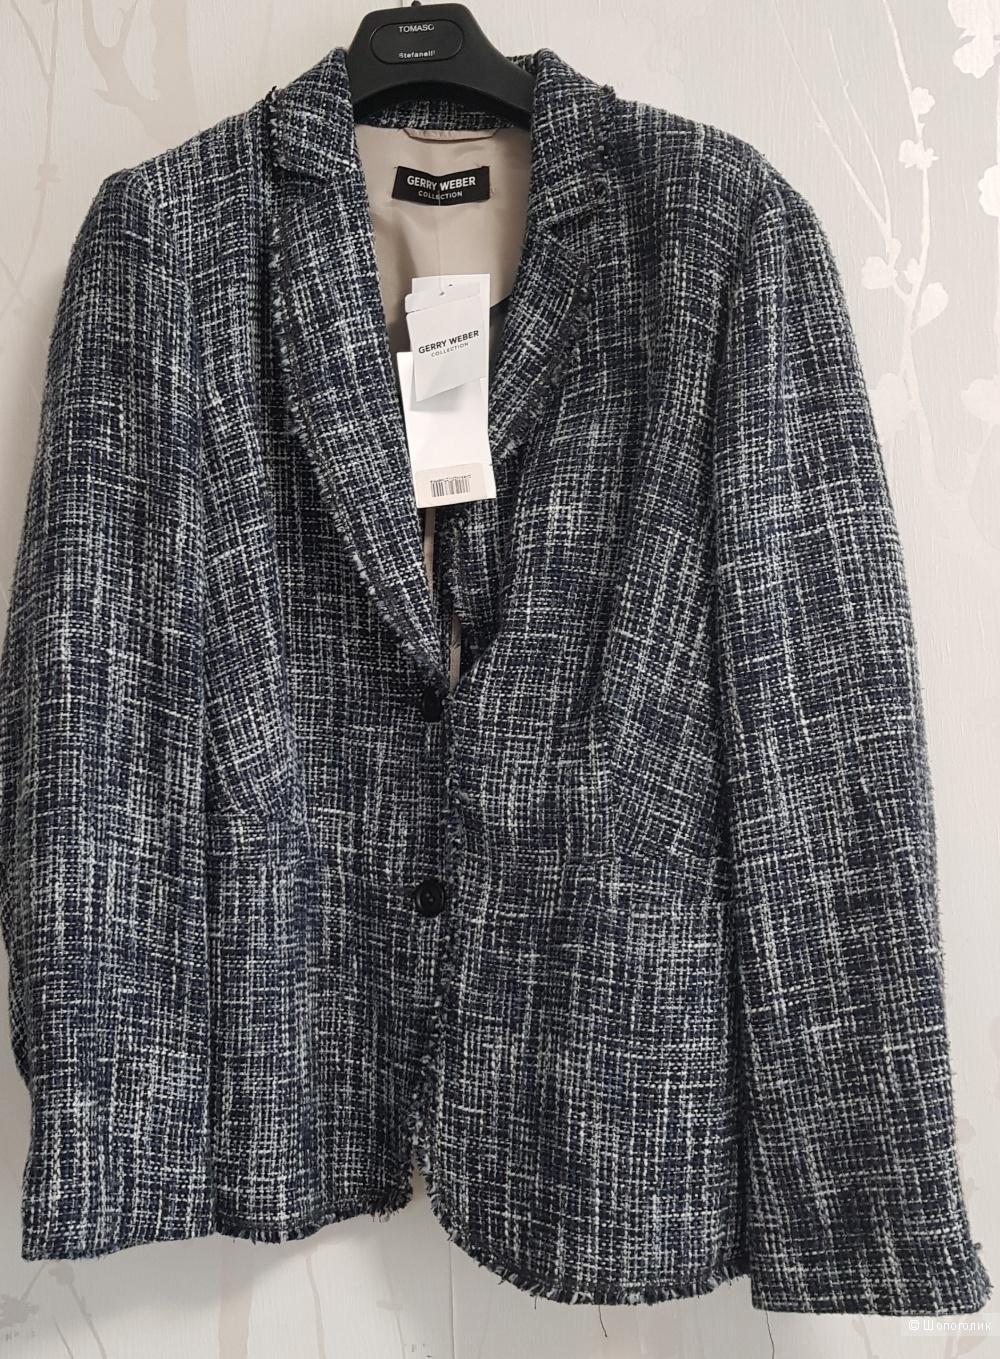 Жакет Gerry Weber collection, 54+ размер (48 немецкий)